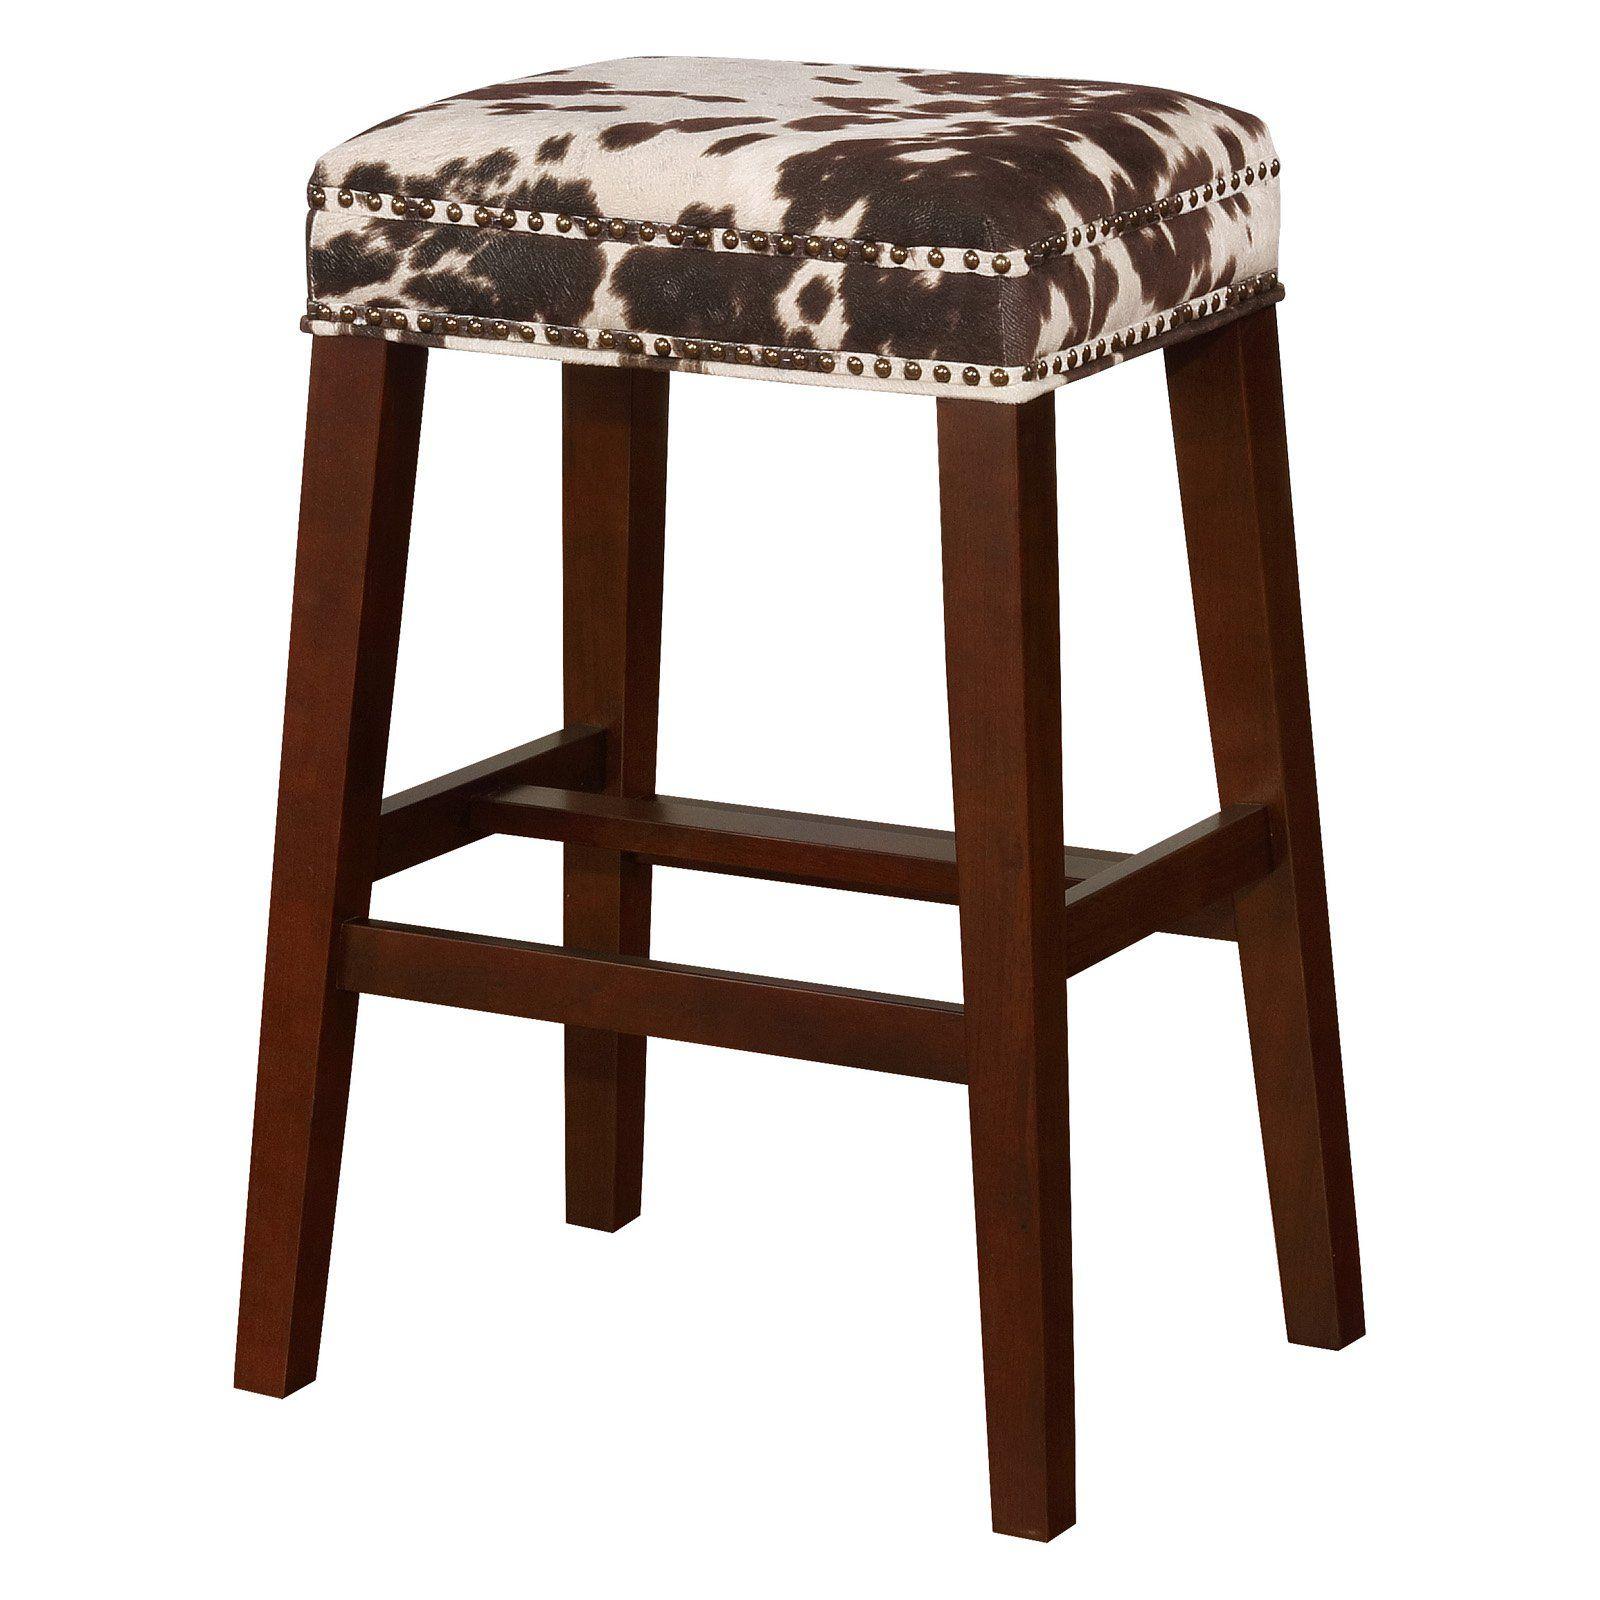 Incredible Linon Walt Cow Print Backless Bar Stool Brown In 2019 Creativecarmelina Interior Chair Design Creativecarmelinacom